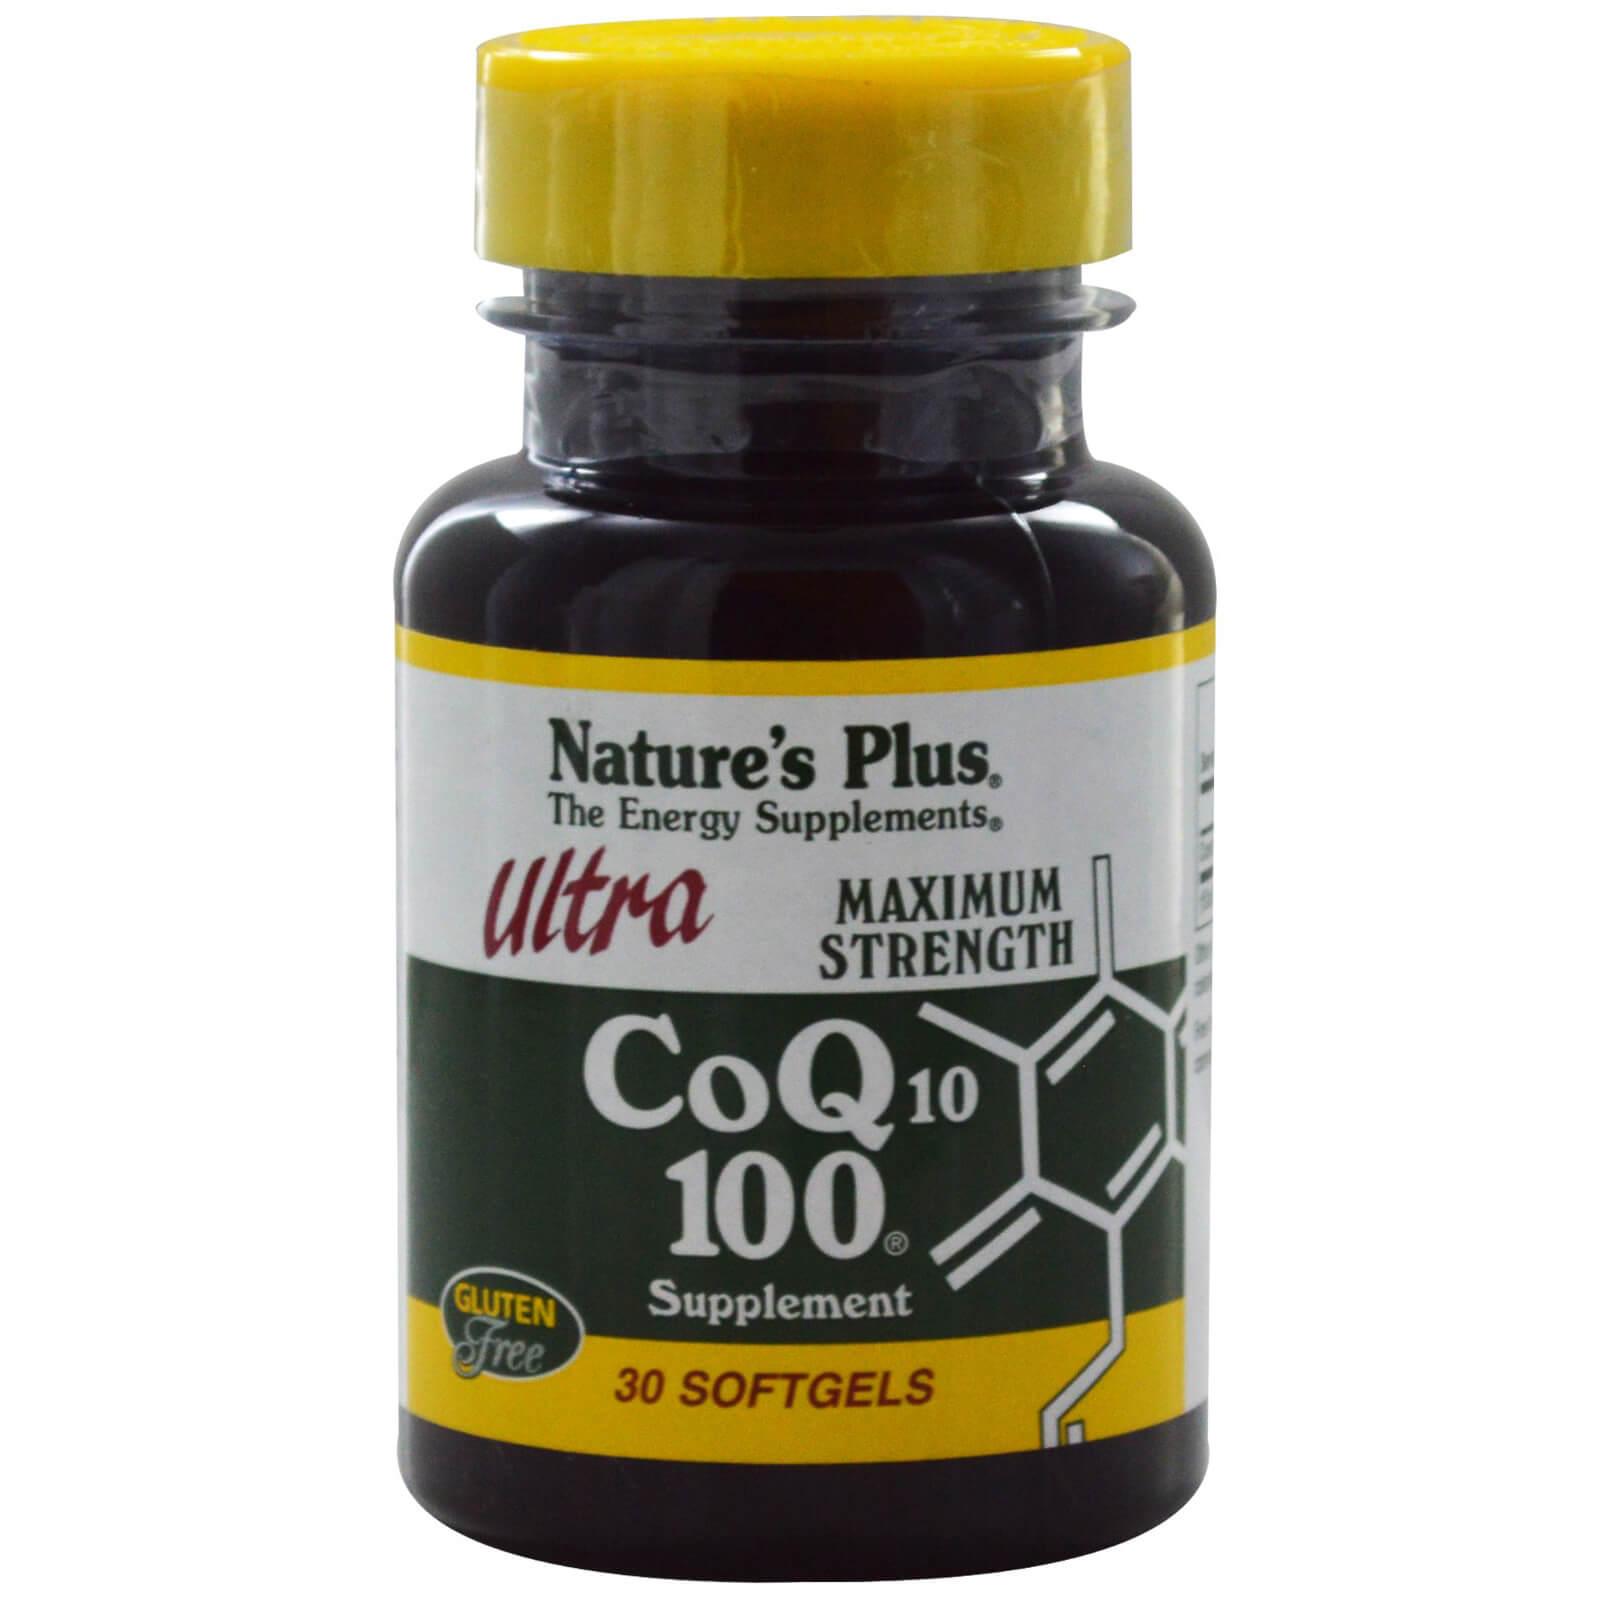 Natures Plus Ultra Co-Q10 100mg Συμπλήρωμα Διατροφής με Αντιοξειδωτικές Ιδιότητες 30 Softgels